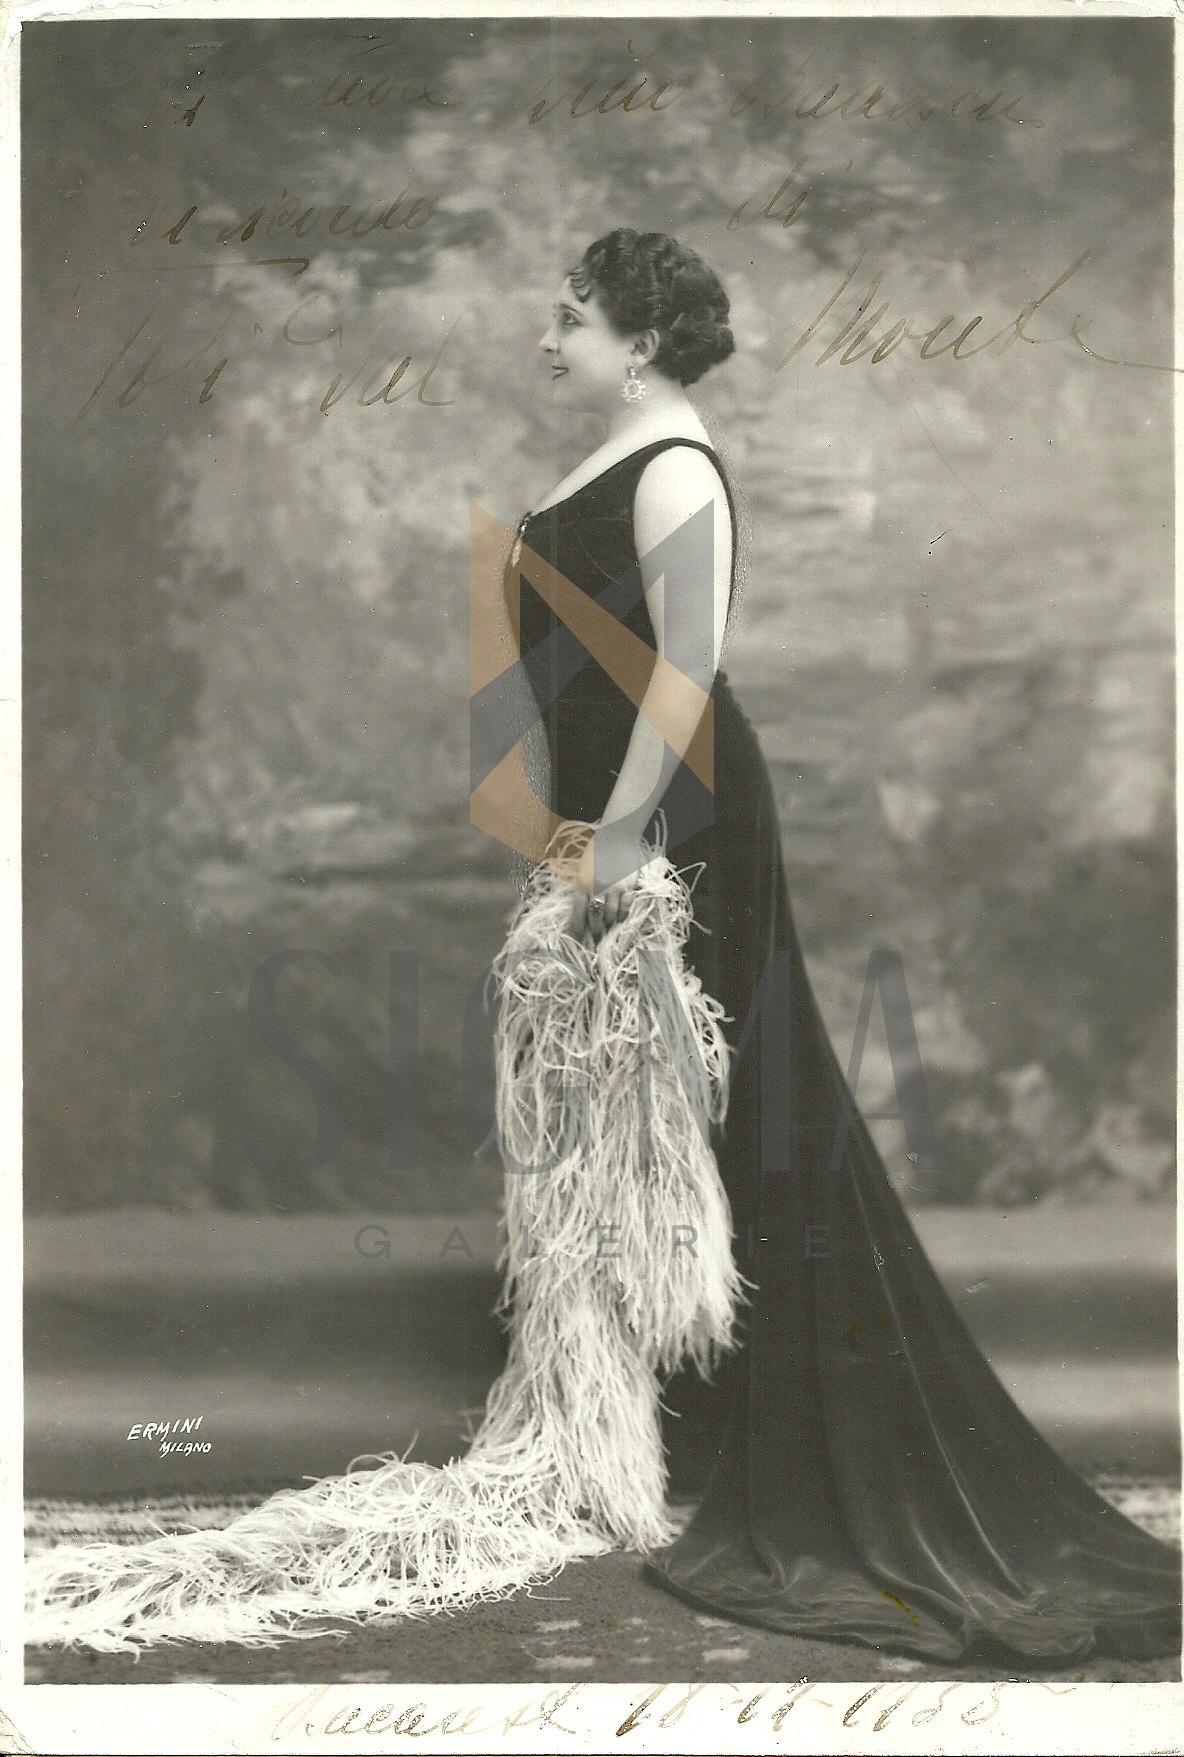 FOTOGRAFIE, SOPRANA  TOTI DAL MONTE ( Antonietta Meneghel ) DEDICATIE, 1935